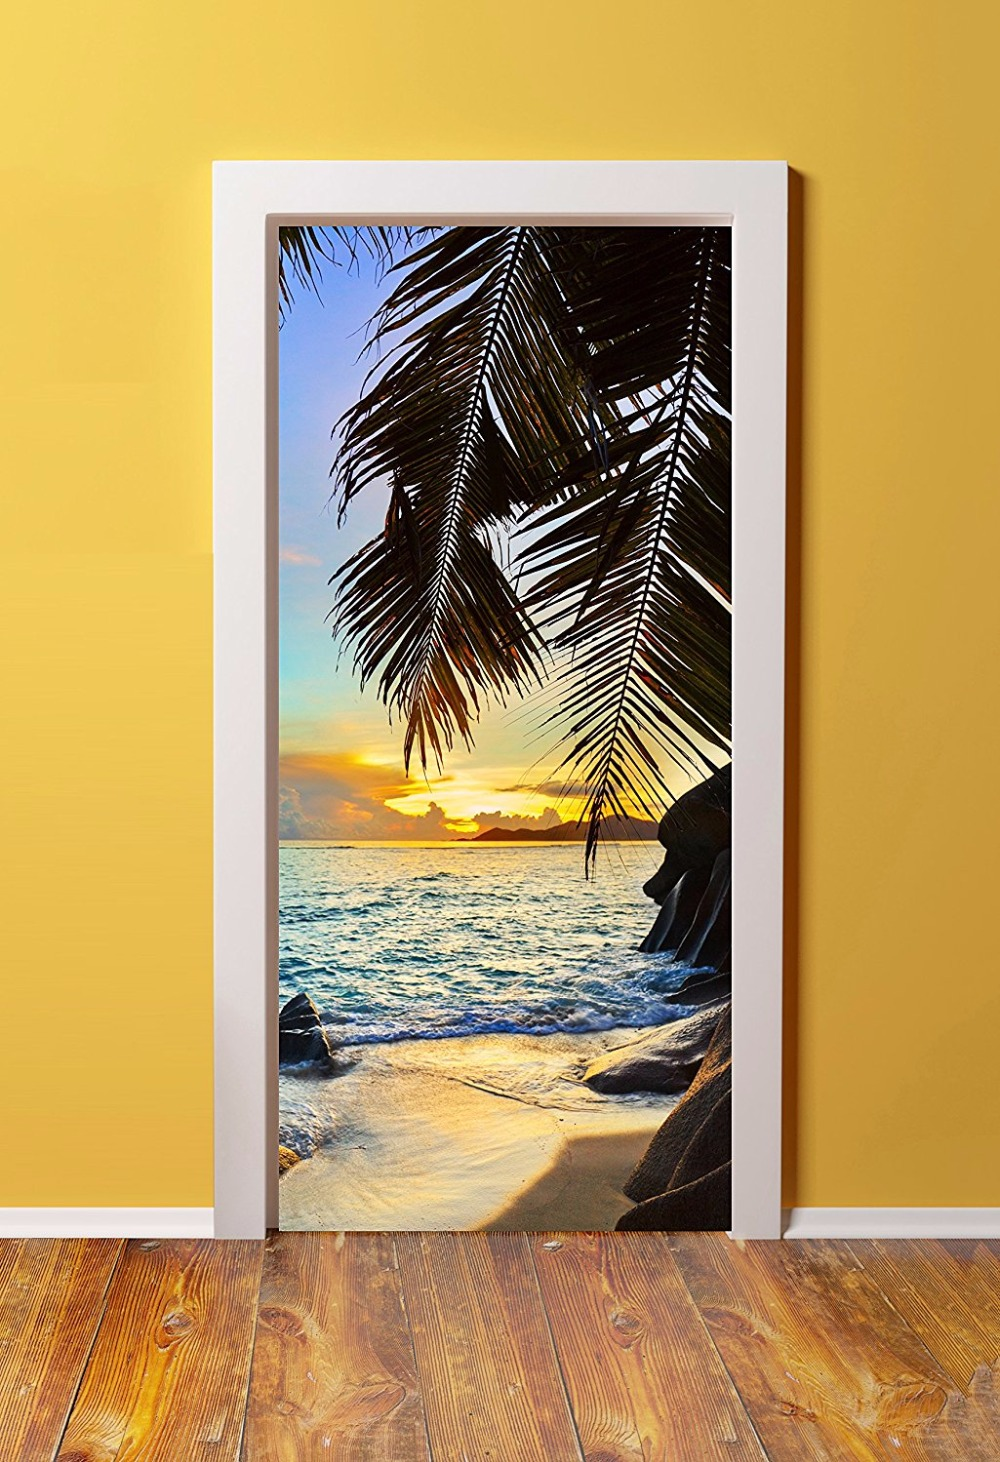 Diy 3d Wall Sticker Mural Home Decor Tropical Island